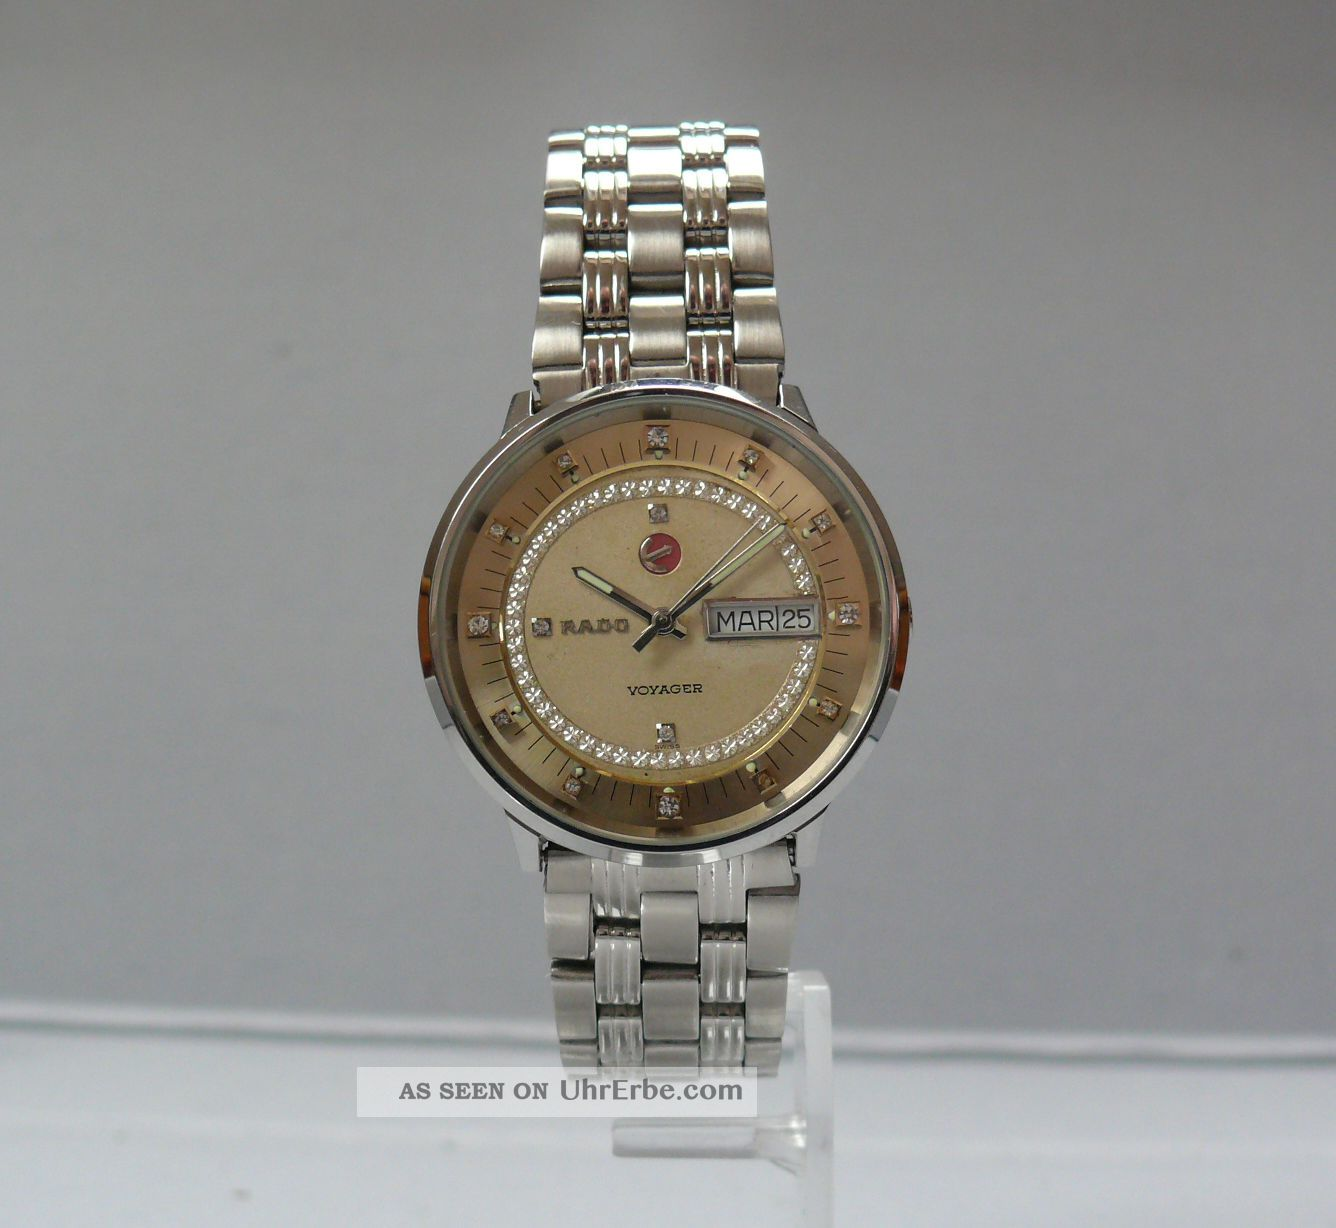 Rado Voyager Automatic 1970´er Jahre (24.  71 - 515) Armbanduhren Bild